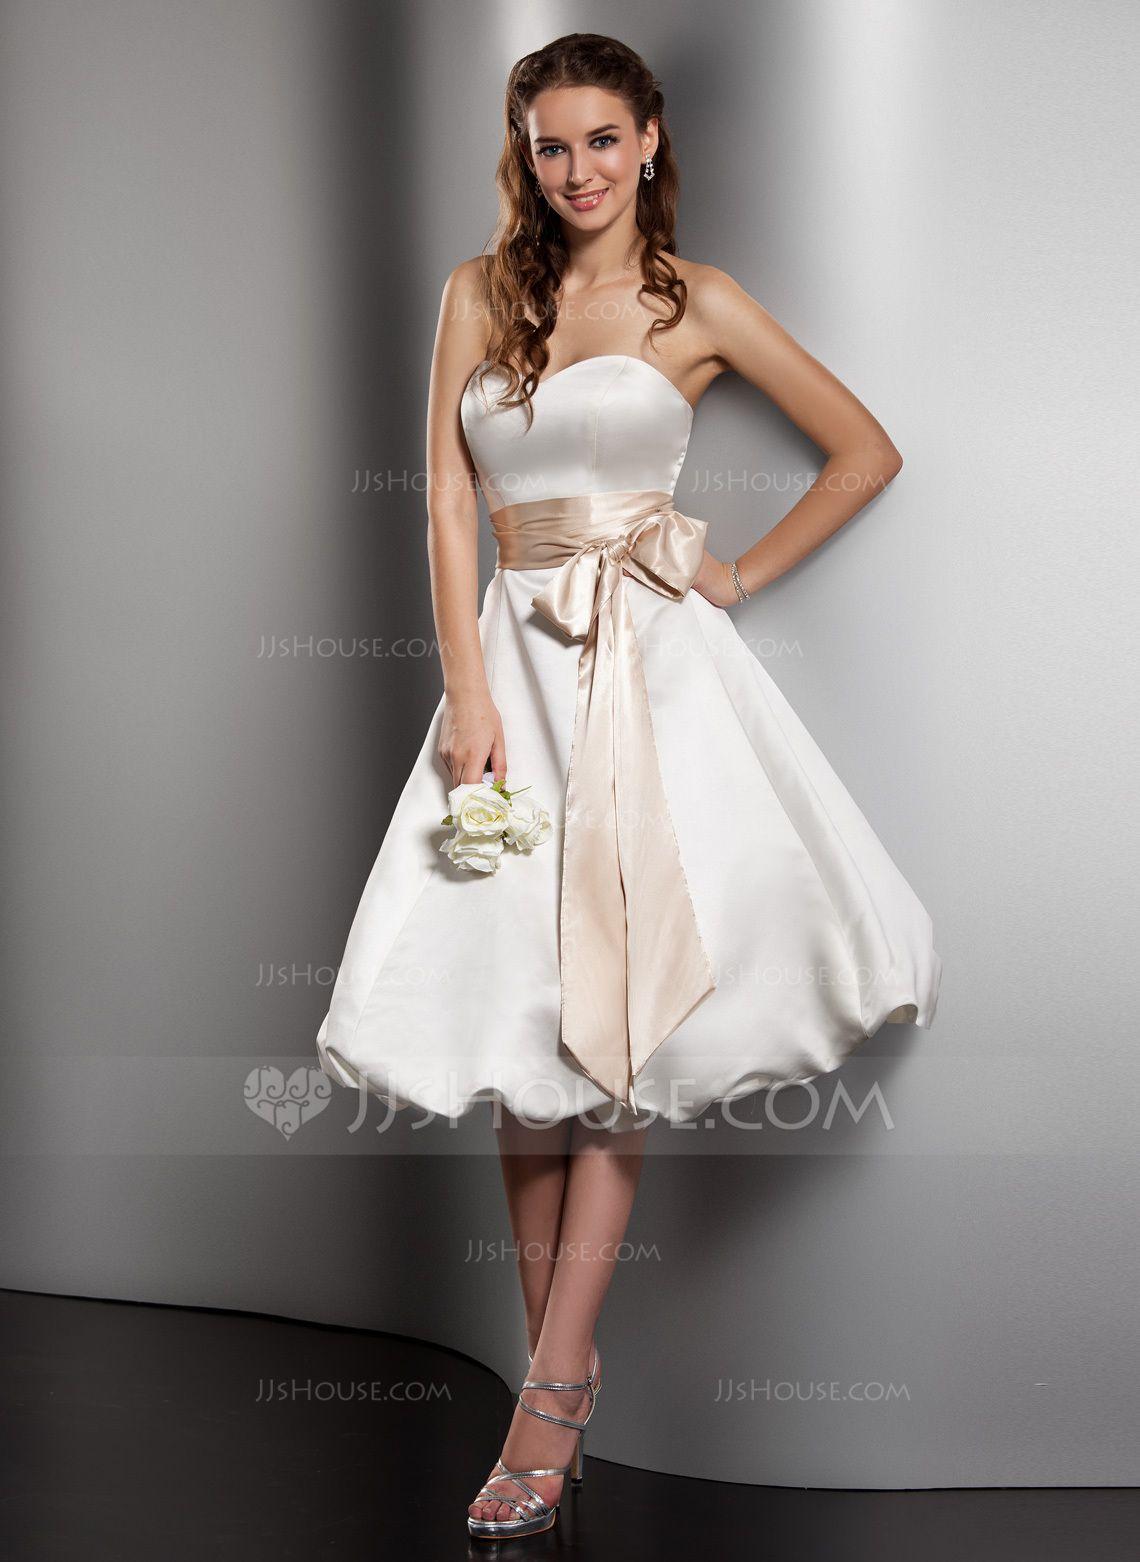 6aedfcf5e Corte A Princesa Escote corazón Altura de la rodilla Satén Vestido de novia  con Fajas Lazo(s) (002001379) - JJsHouse